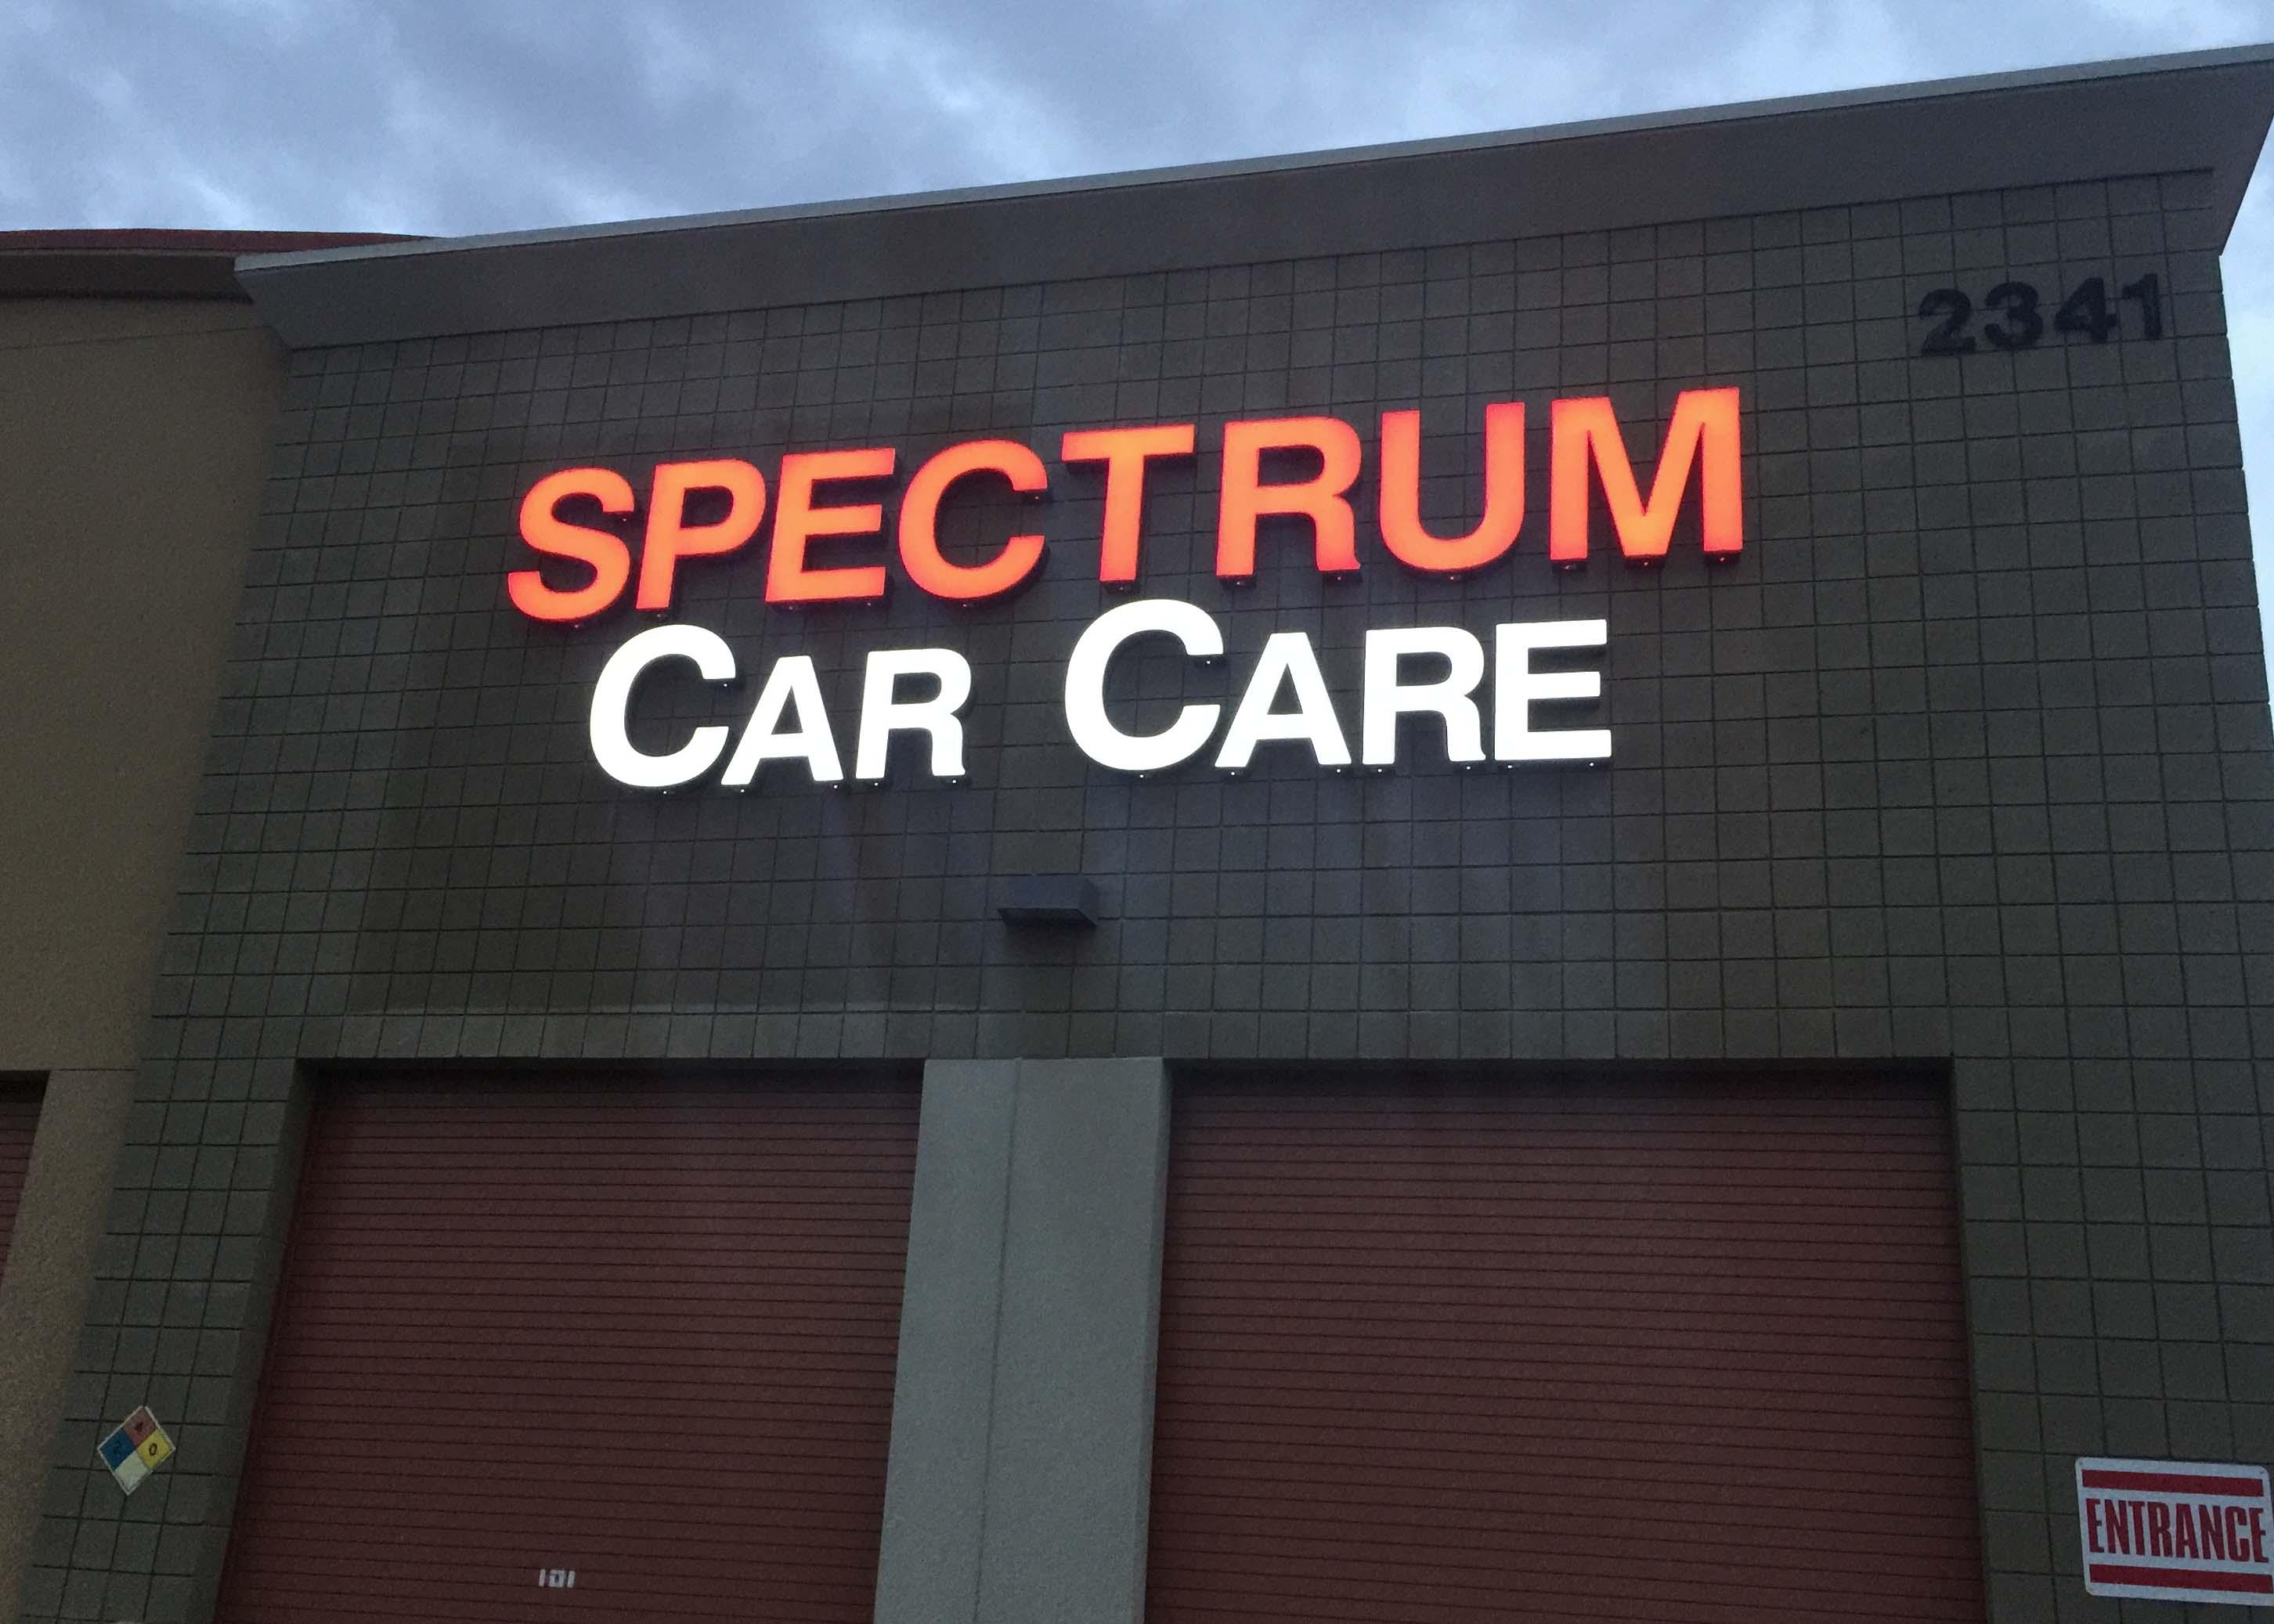 Spectrum Car Car Channel Letter Sign dusk